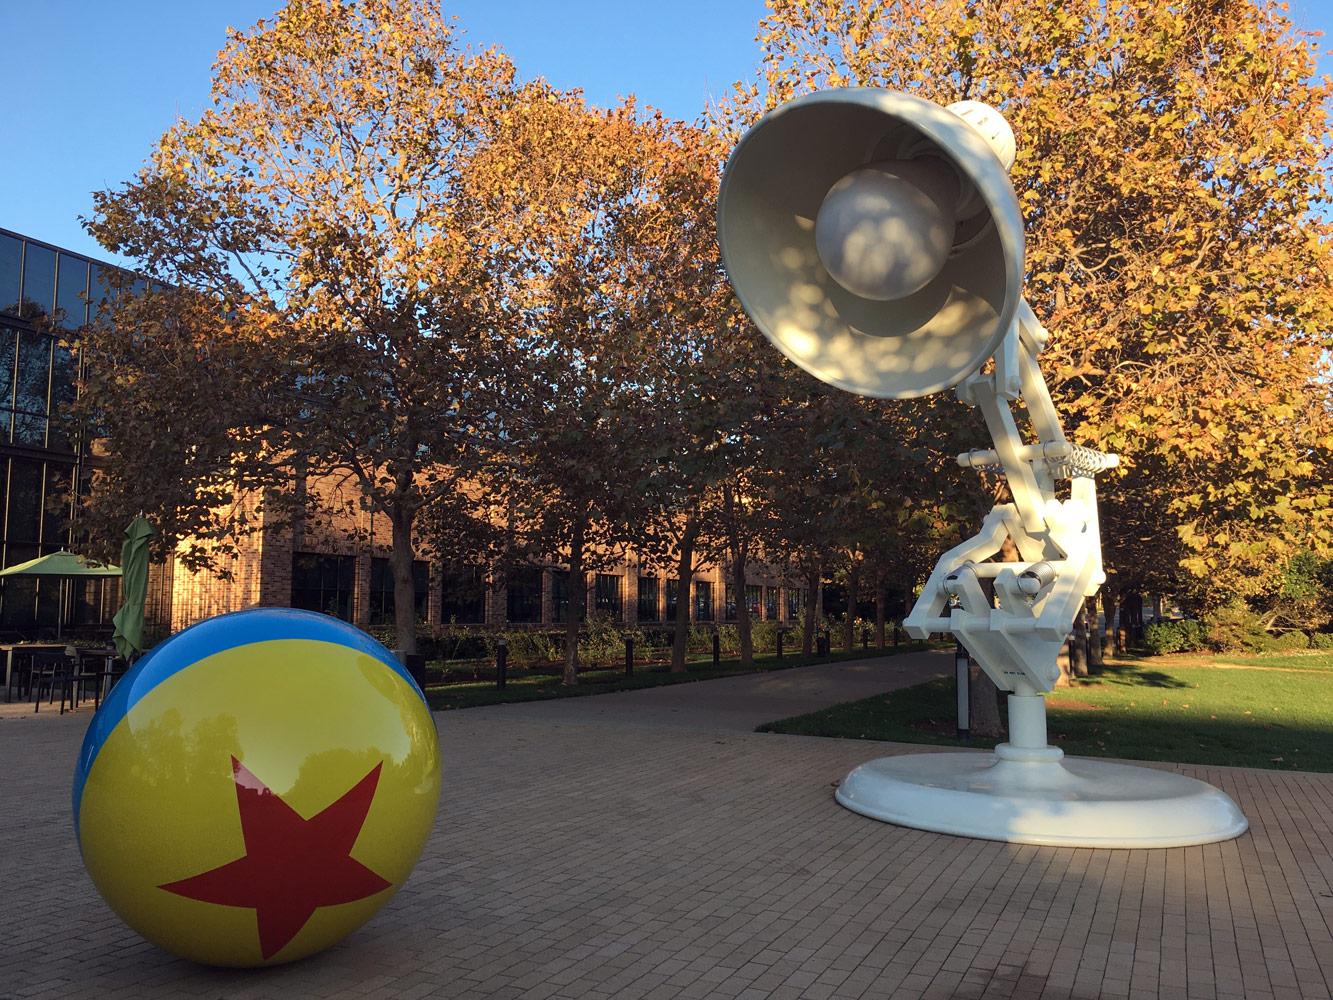 Pixar's famous Lamp and Ball